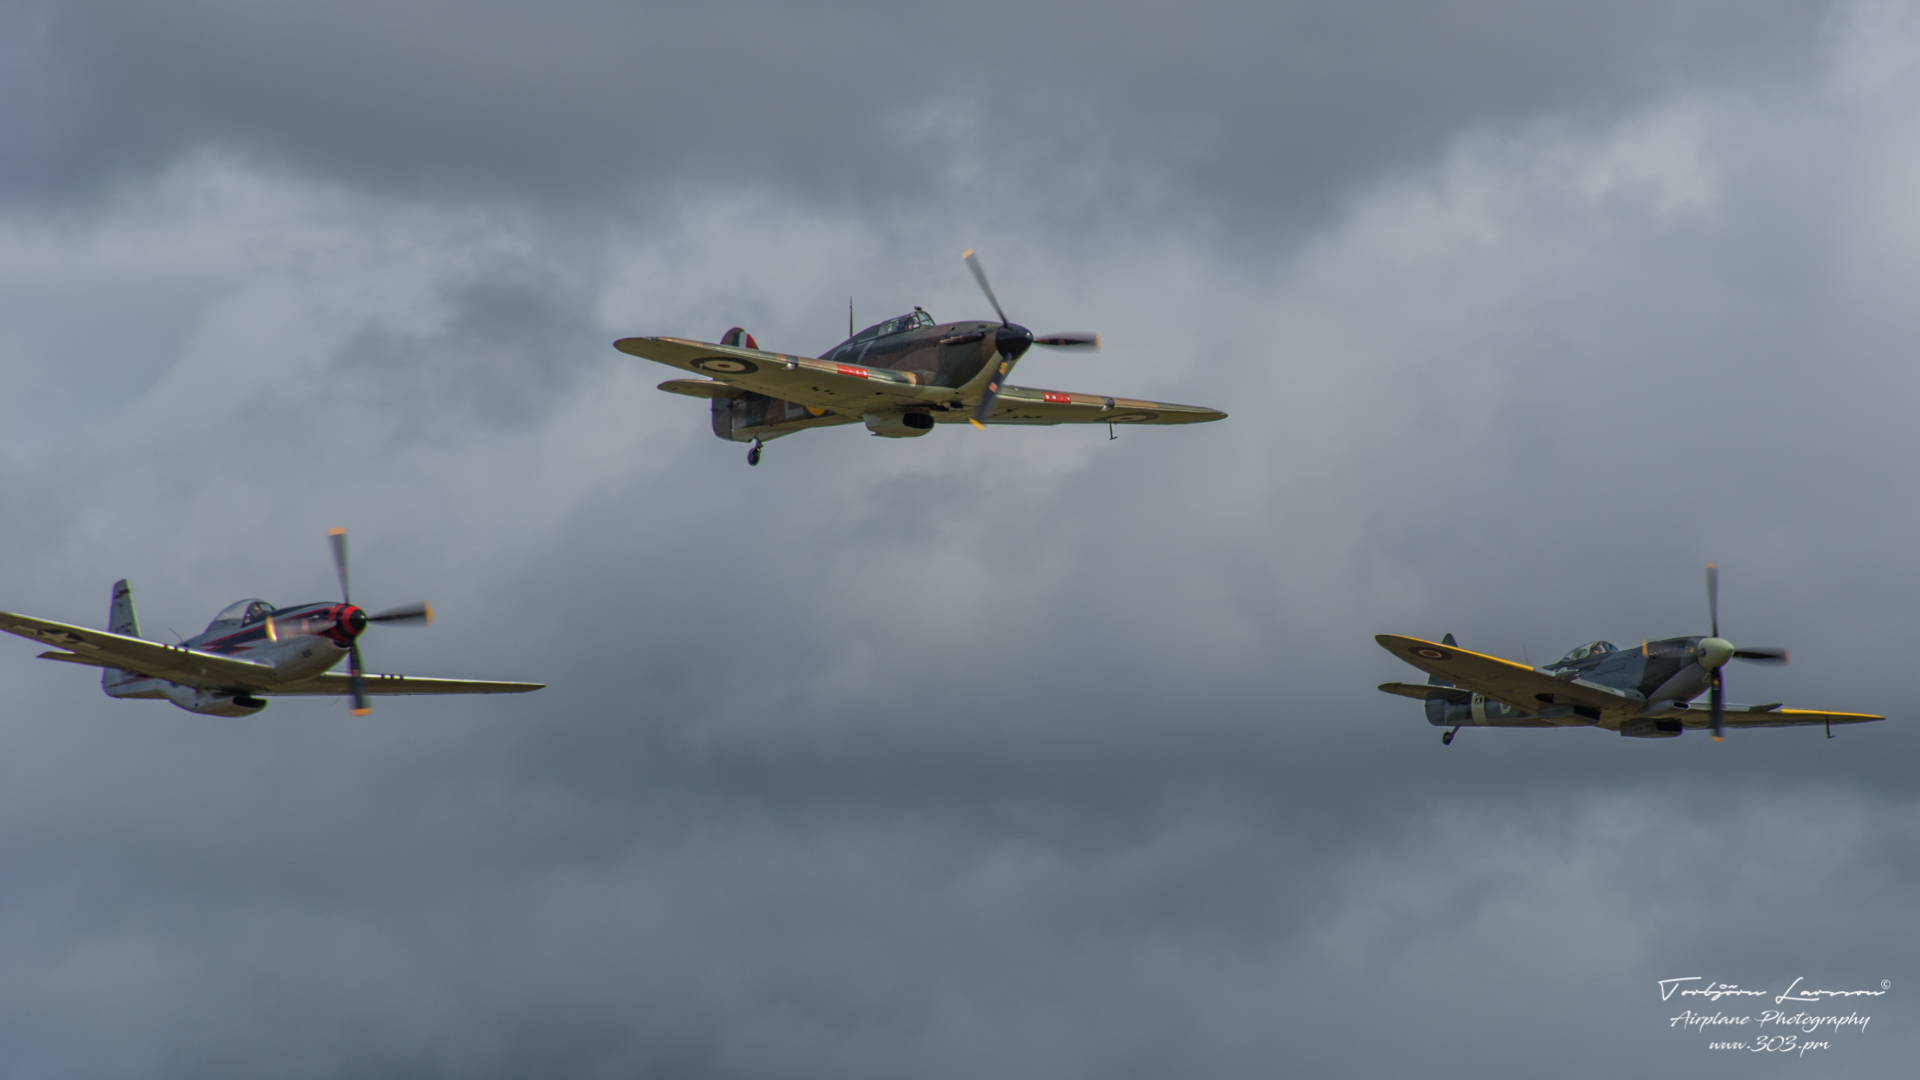 ACE_5331-Classic Warbirds (Vickers Supermarine Spitfire Mk. IX & XVI - North Amercian P-51D Mustang & Hawker Hurricane Mk1)